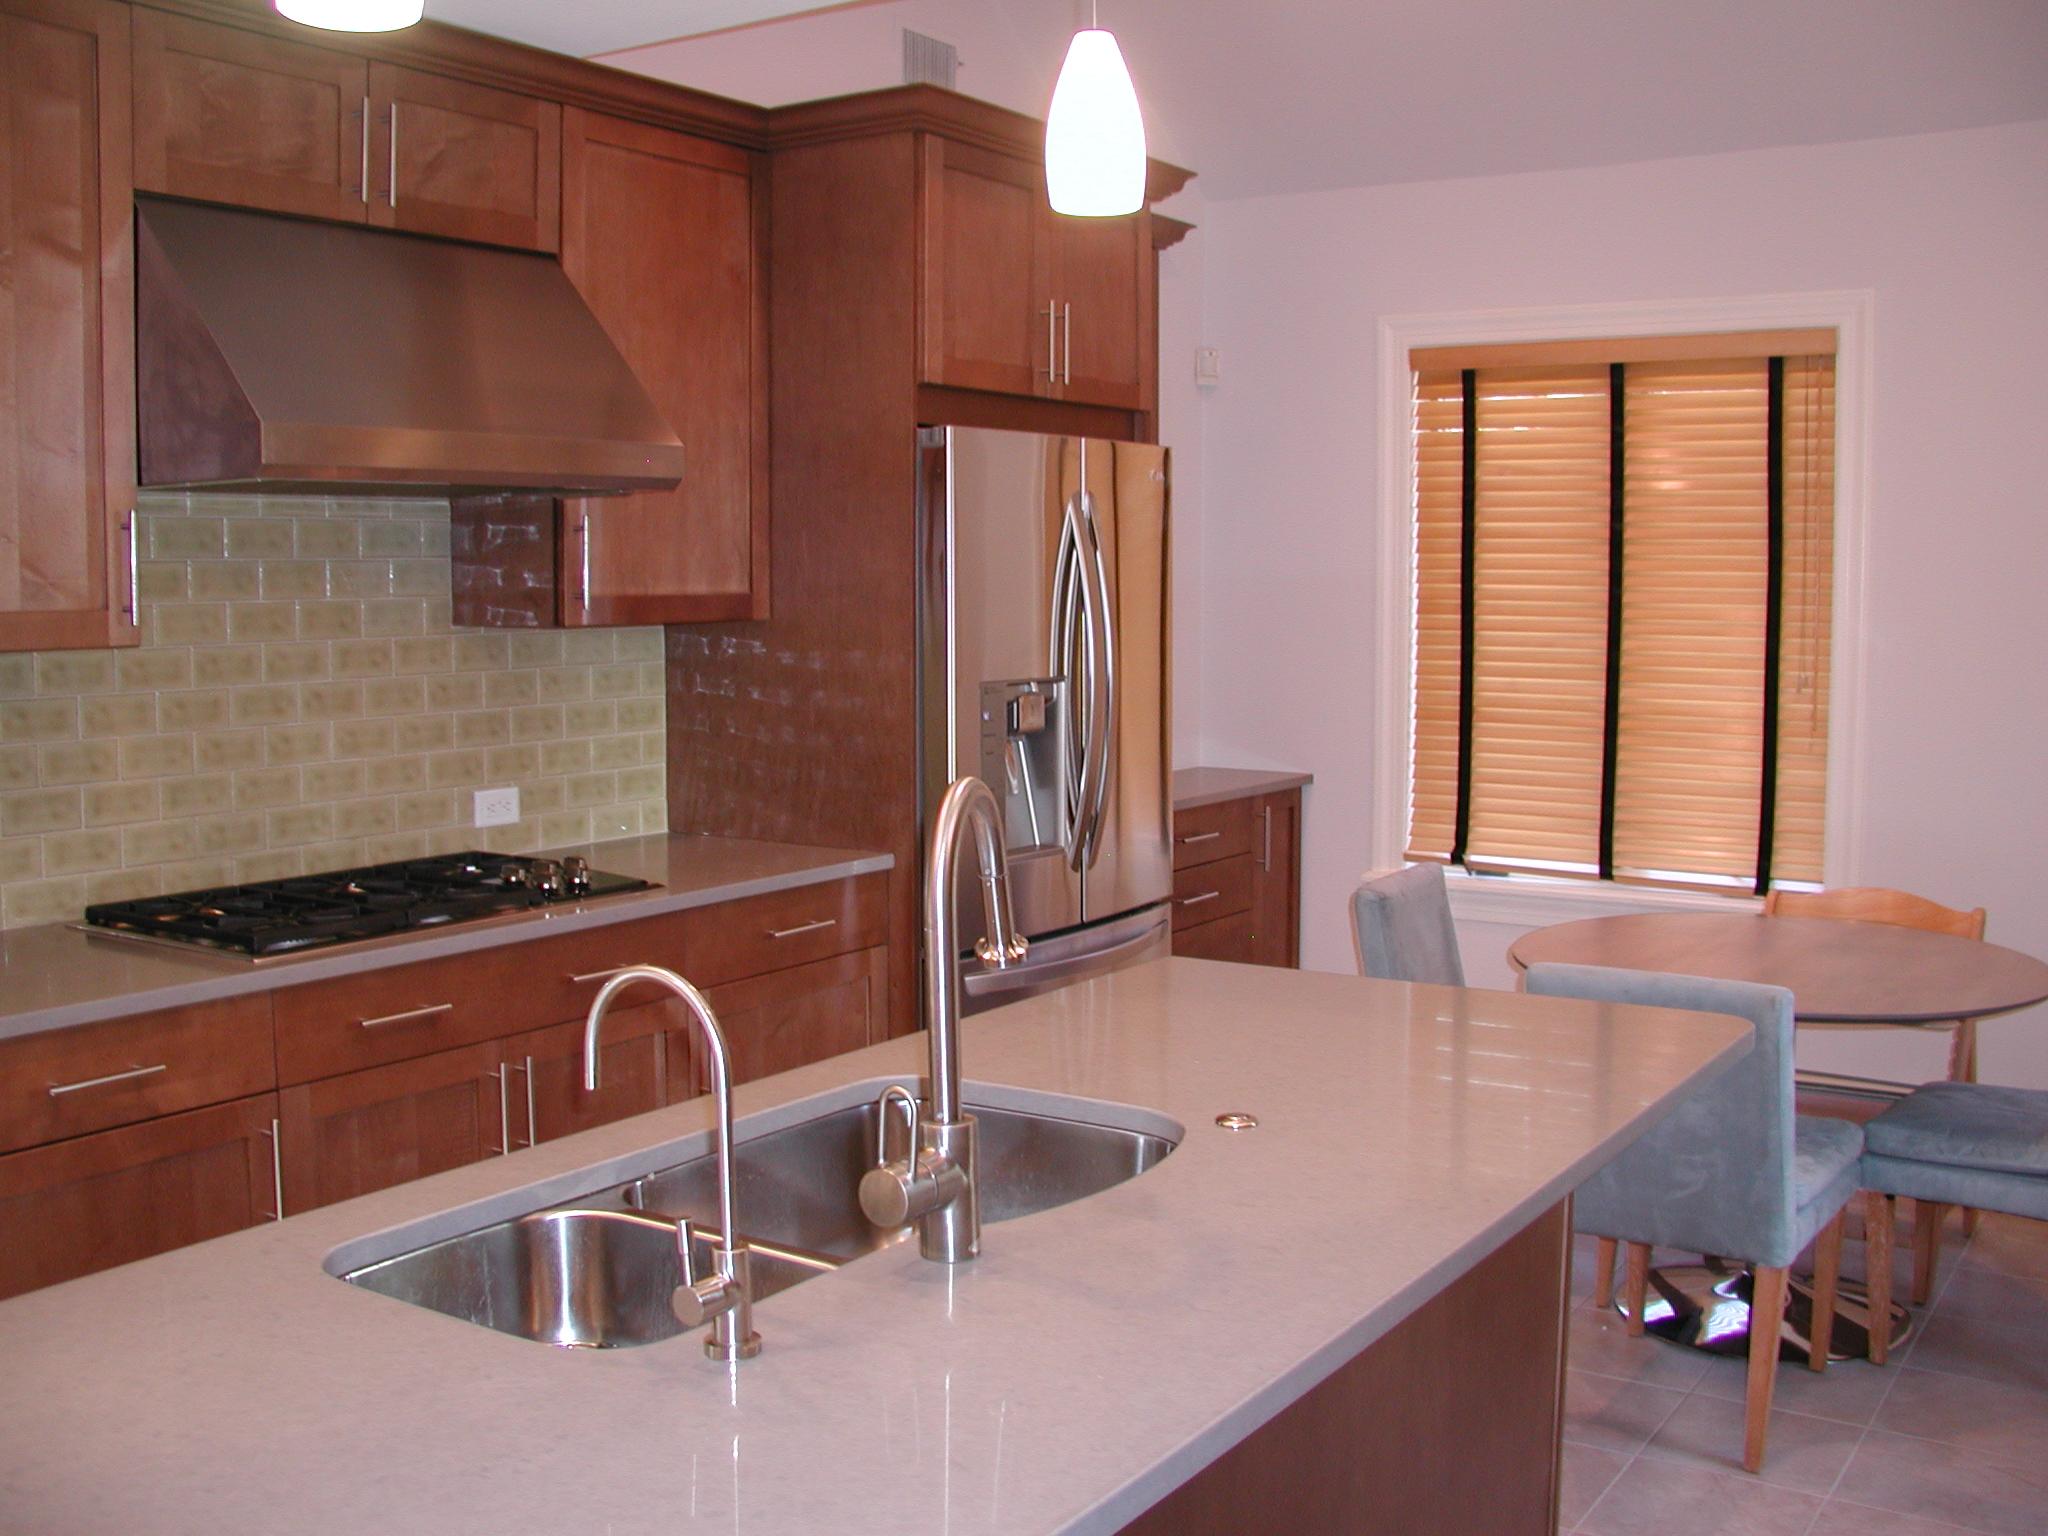 Cabinet Refacing Portfolio   Dreamwork Kitchens   Westchester, NY ...